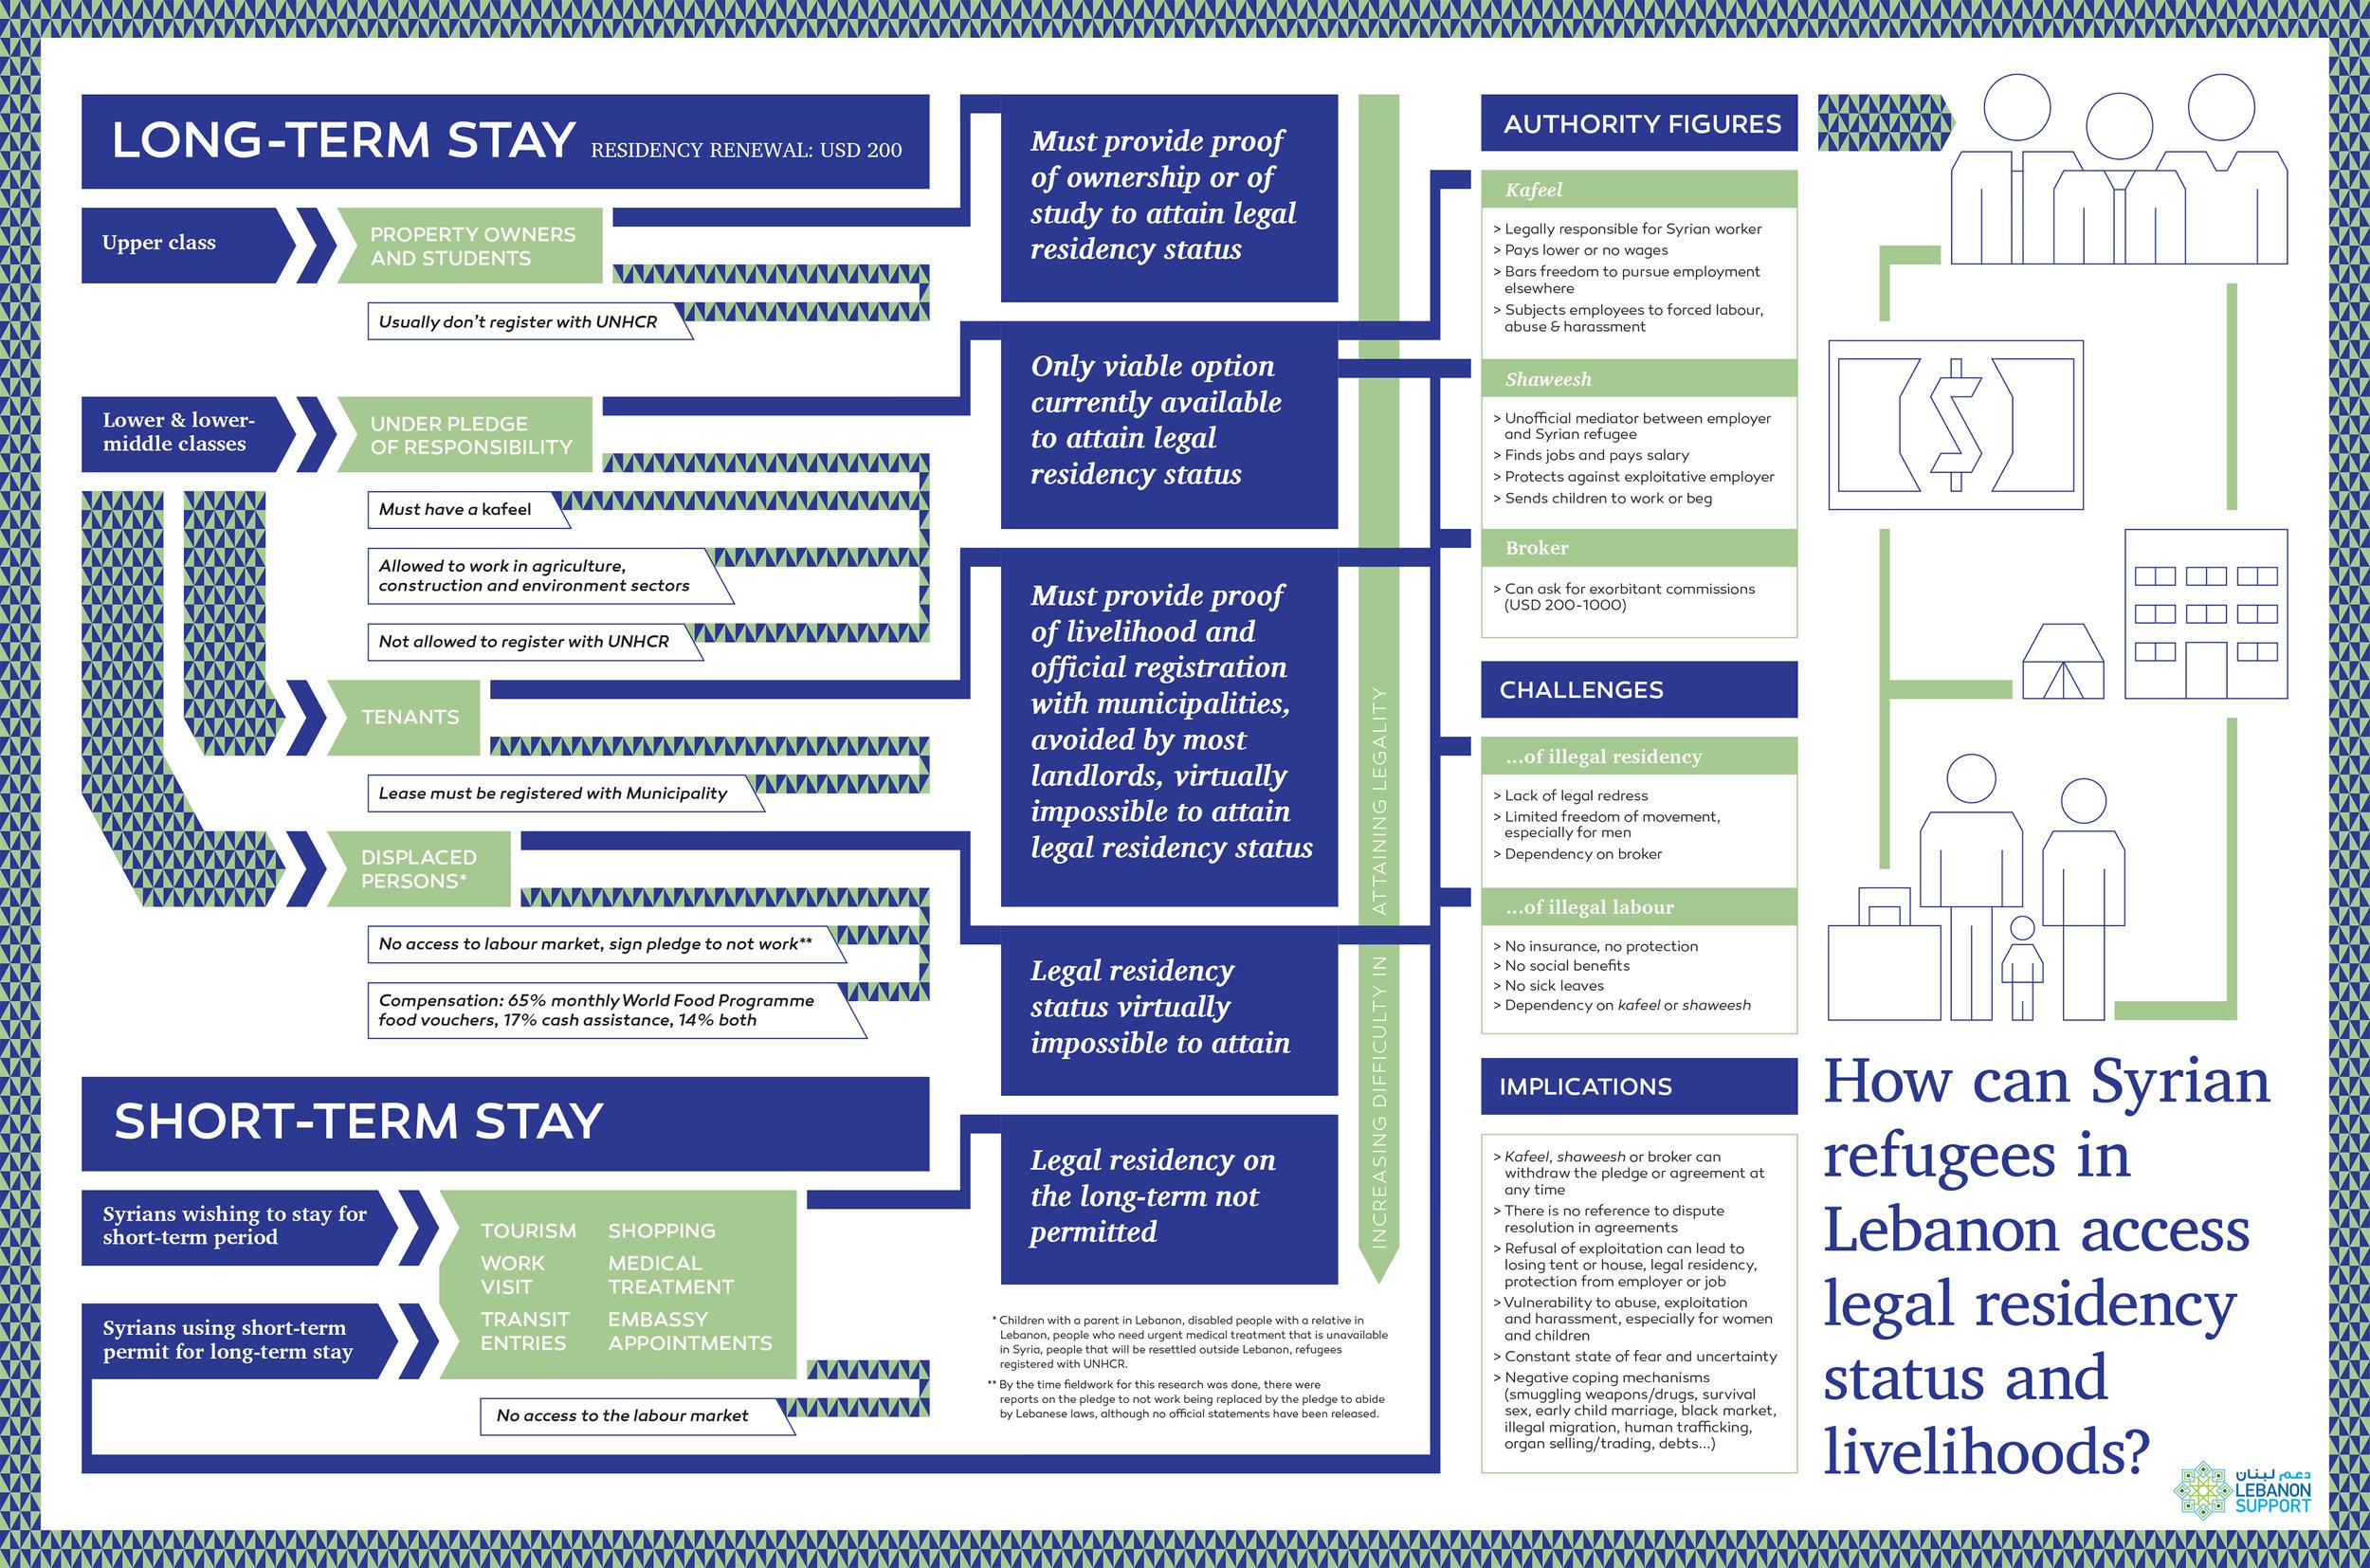 ls-syrianrefugees-accesstolegalresidencylivelihoods-infog2016.jpg